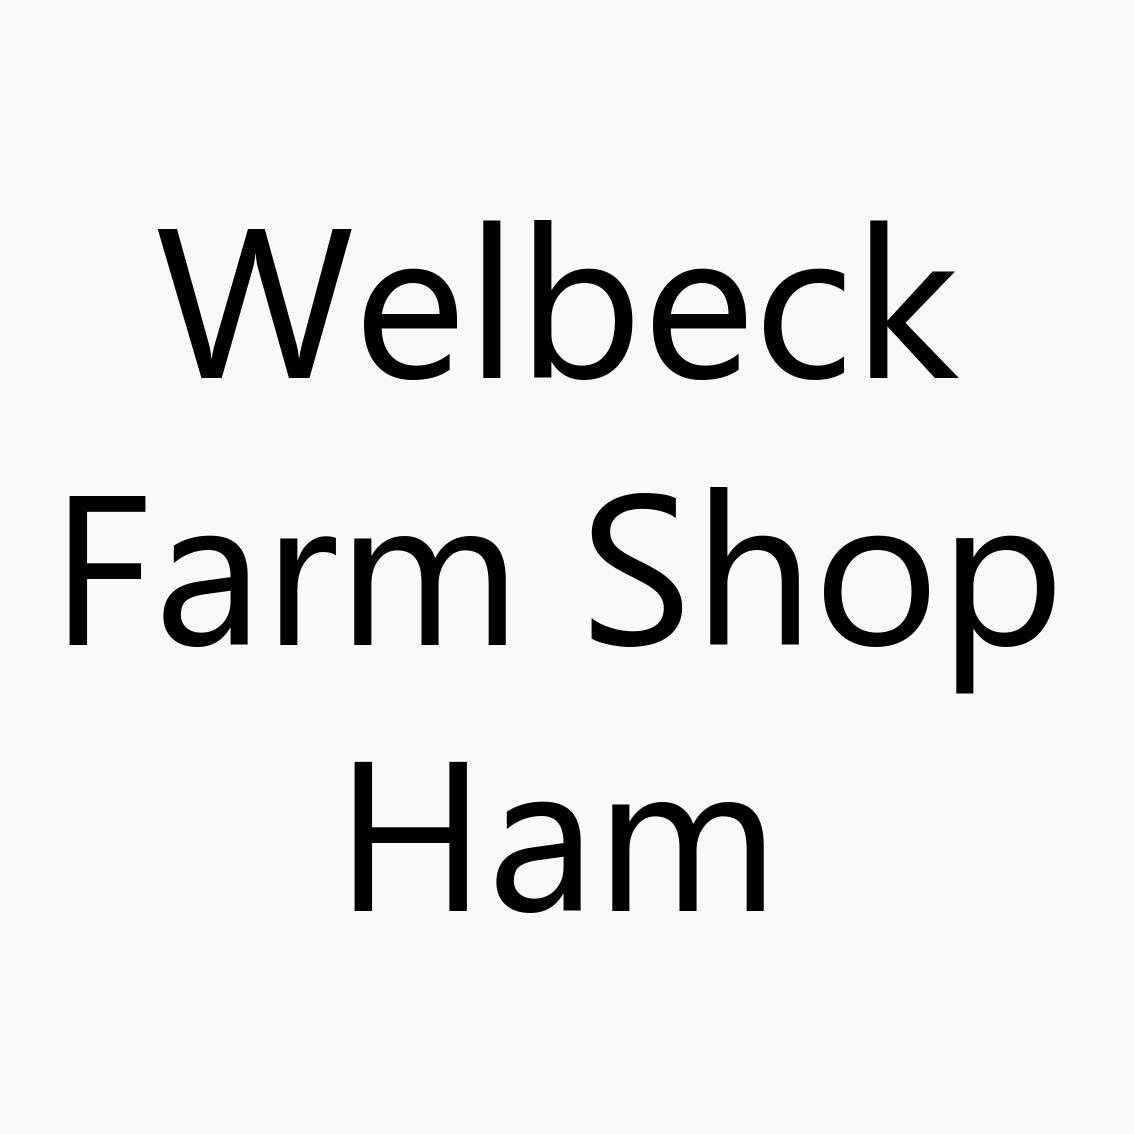 Welbeck Farm Shop Ham